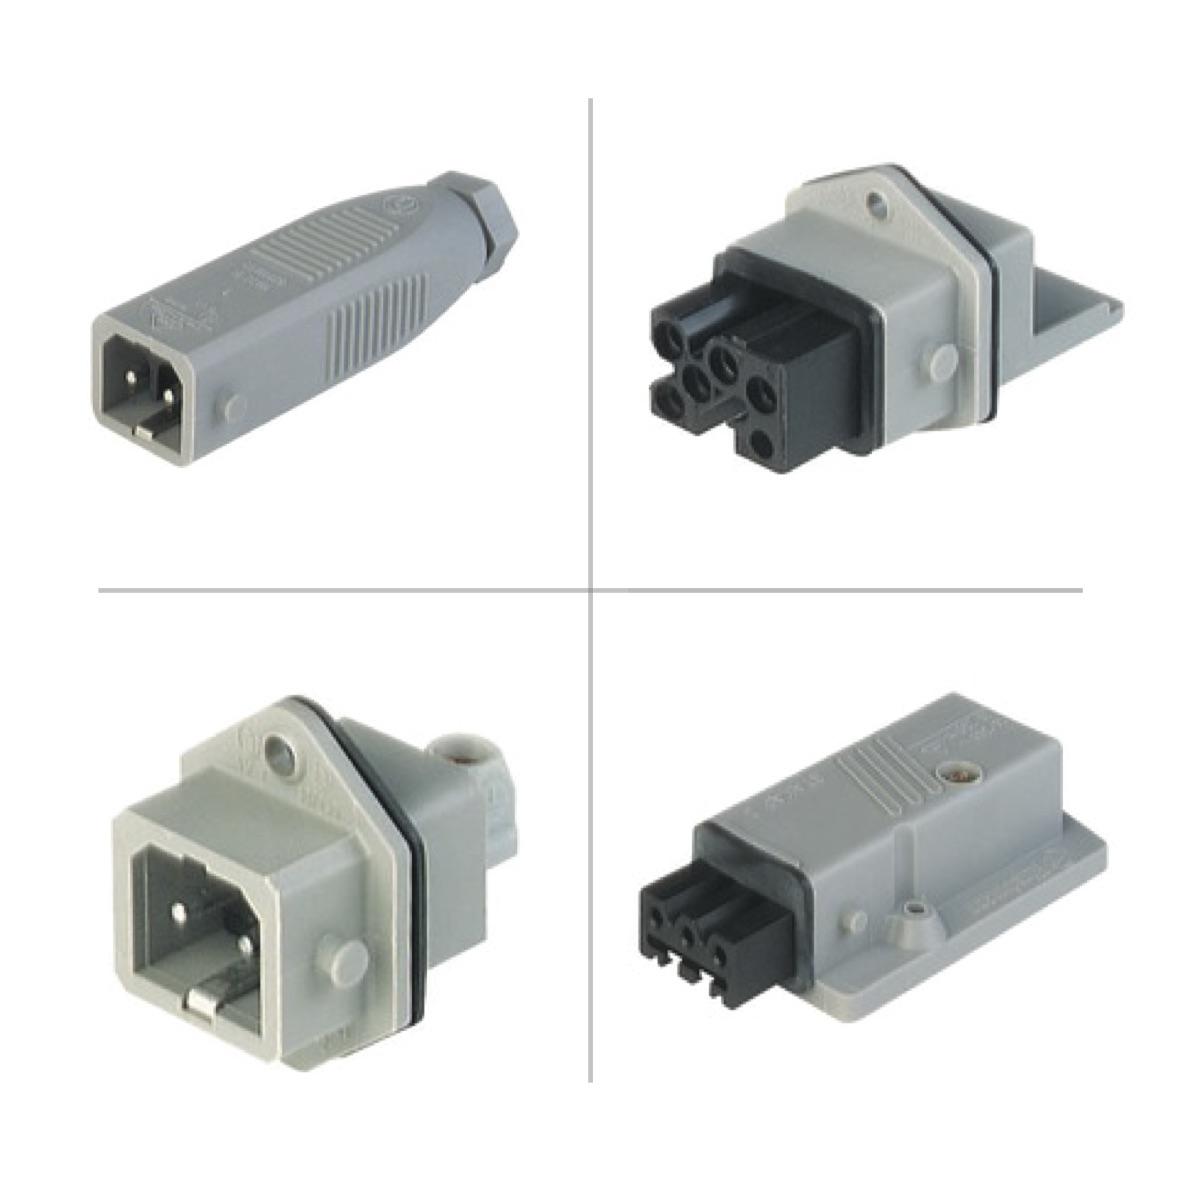 Hirschmann ST Series Power Connectors